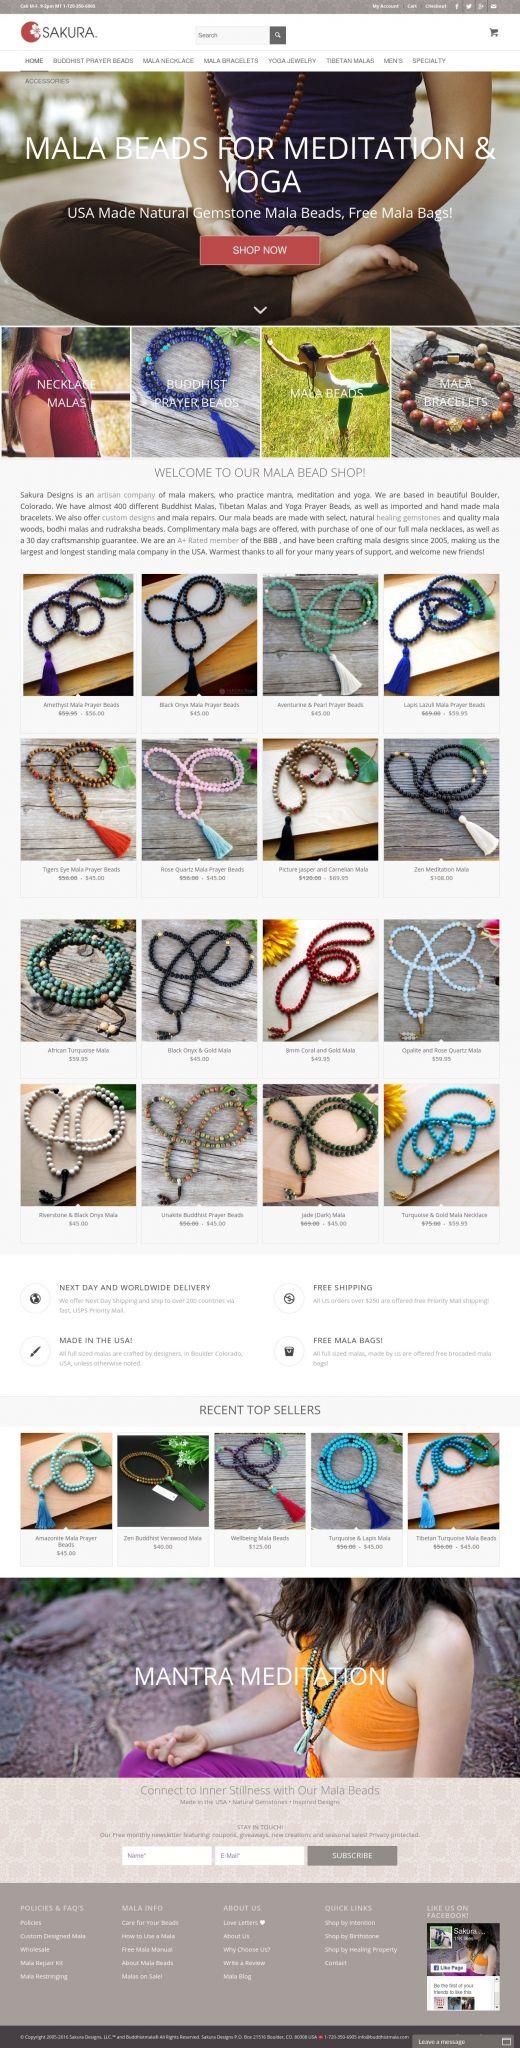 new website for mala beads